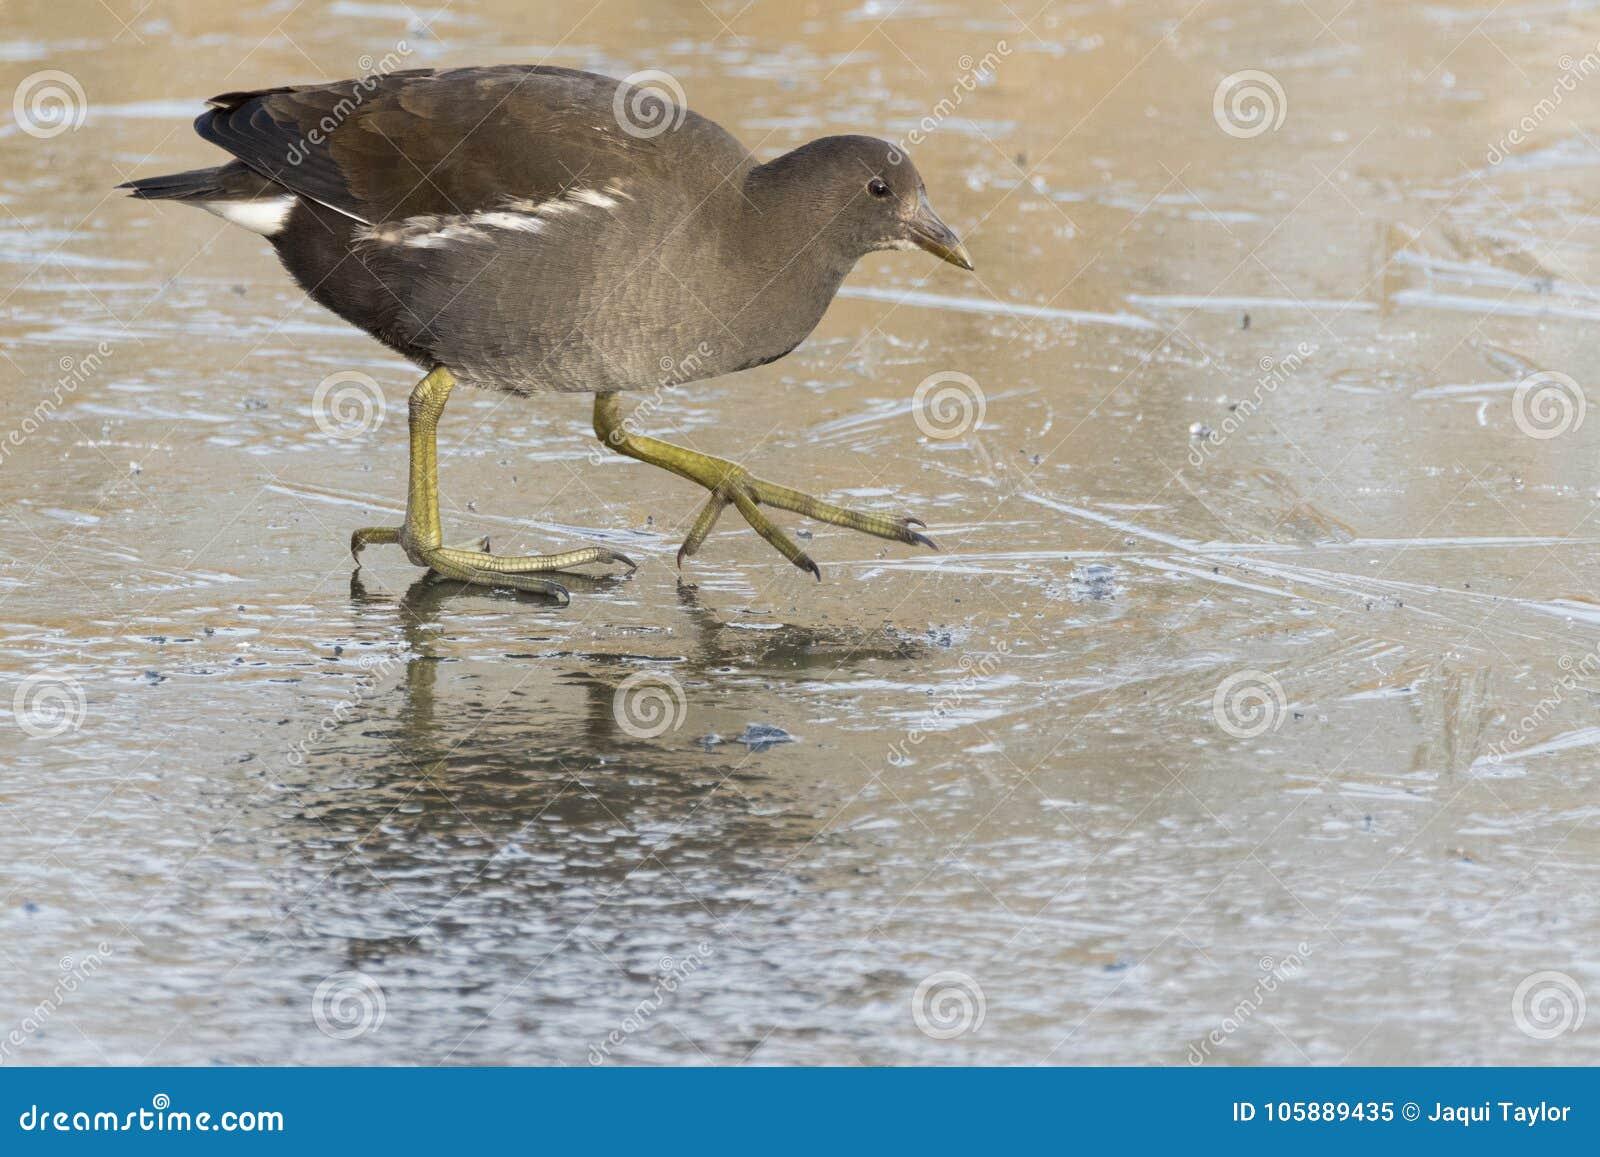 Download A Juvenile Moorhen Walking On Ice Stock Image - Image of moorhen, freezing: 105889435